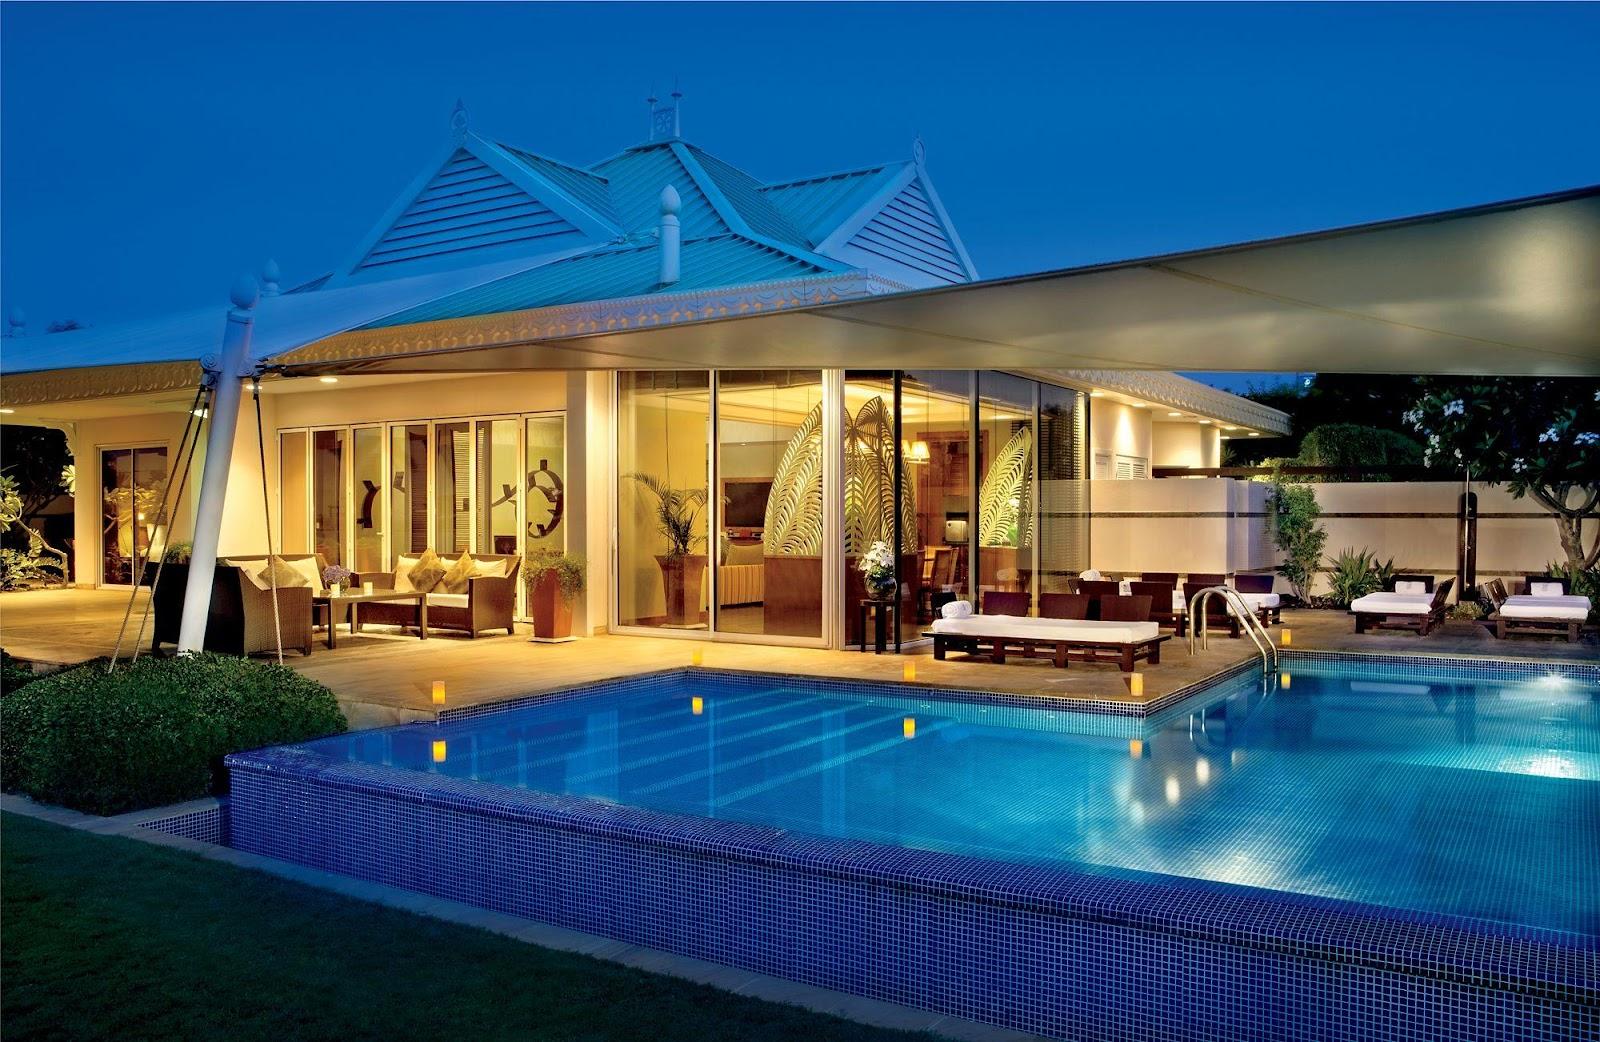 https://ritzcarlton-h.assetsadobe.com/is/image/content/dam/the-ritz-carlton/hotels/middle-east-and-africa/bahrain/bahrain/needs-captions/RCBAHRA_00269.png?$XlargeViewport100pct$